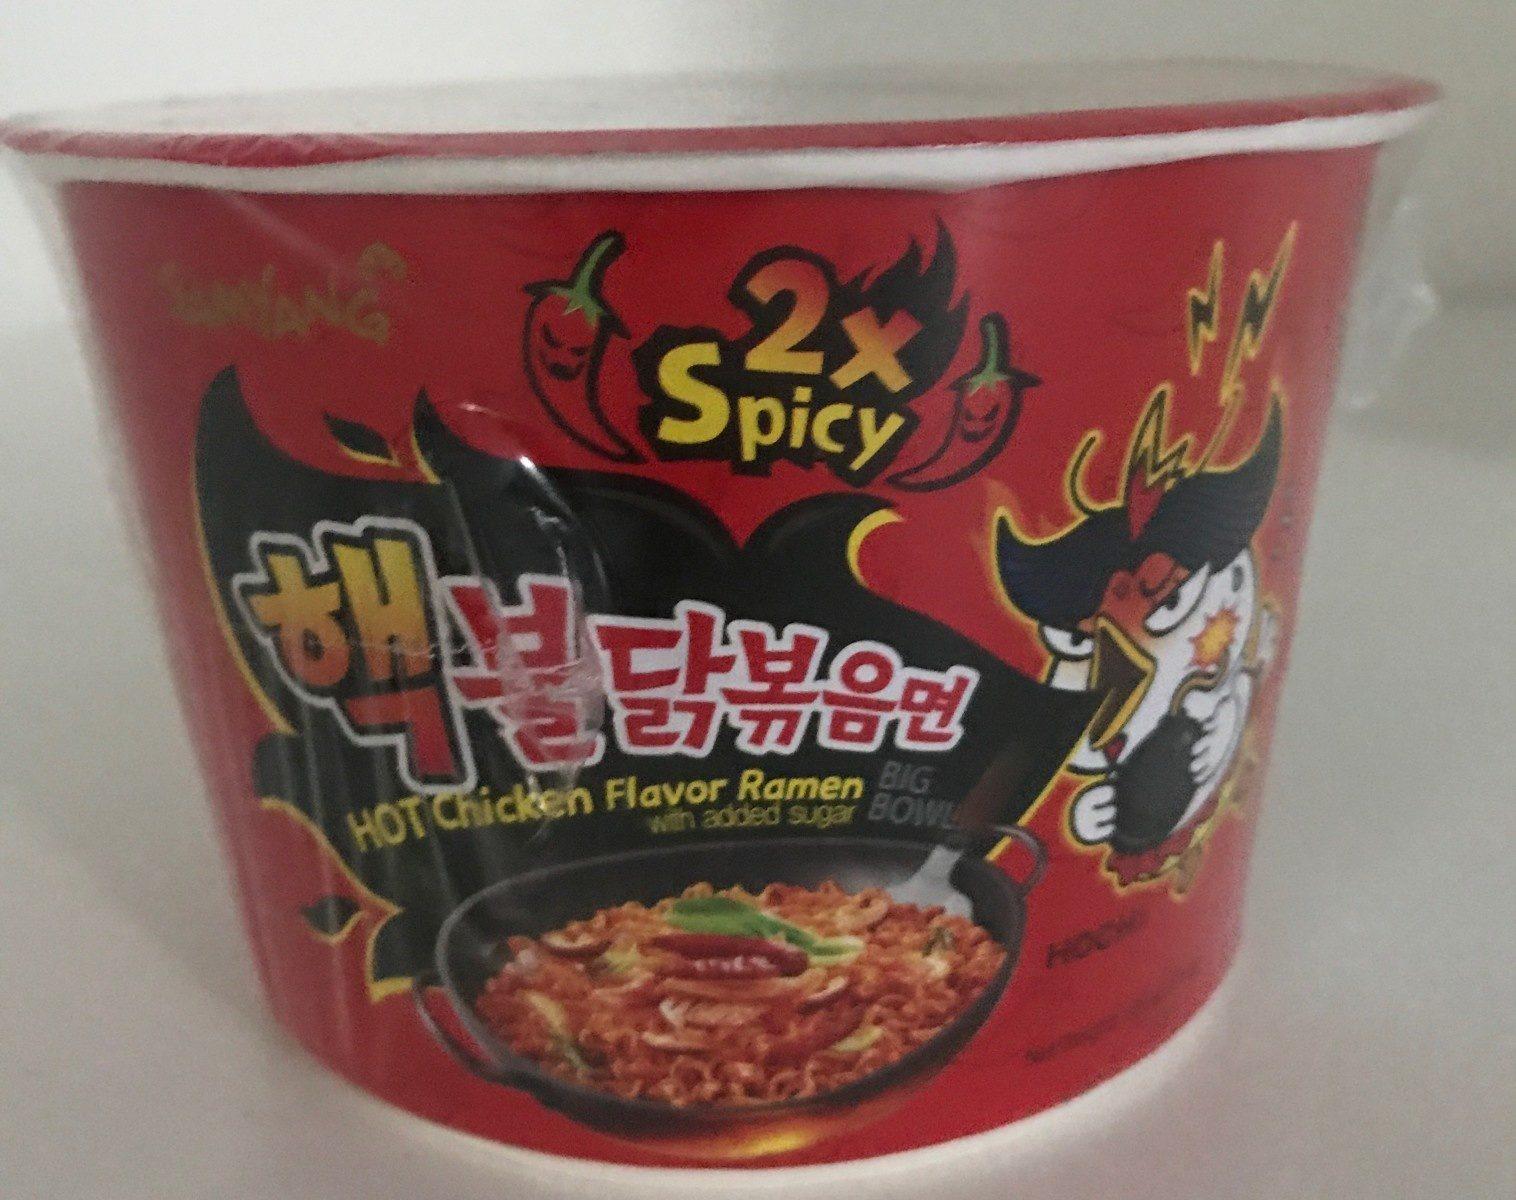 Samyang 2X Spicy Bowl - Product